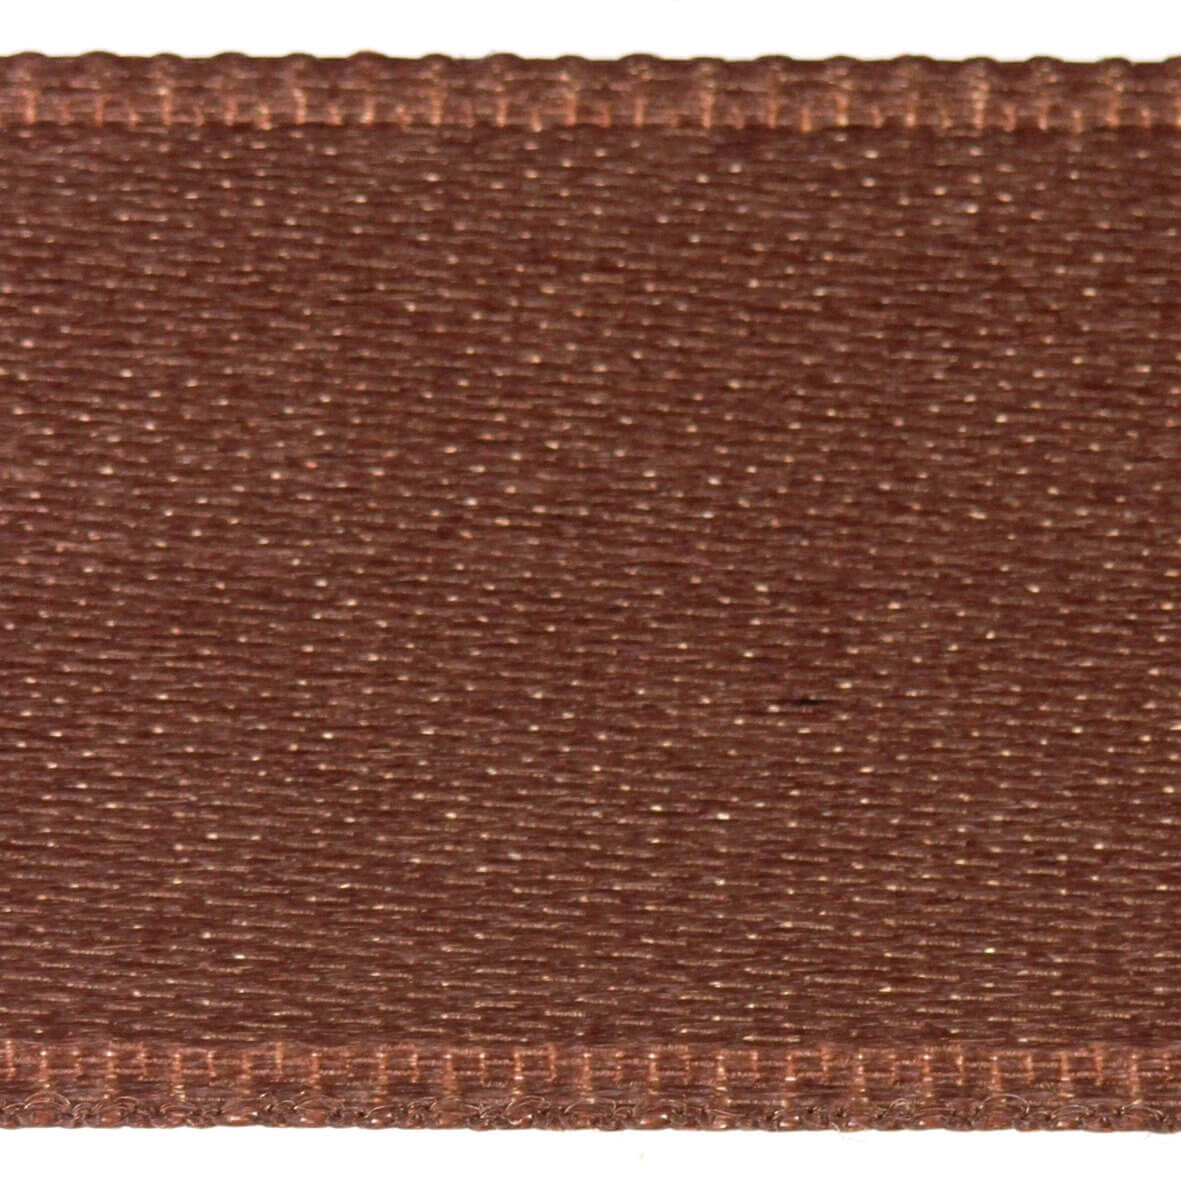 Bitter Chocolate Col. 215 - 25mm Satab Satin Ribbon